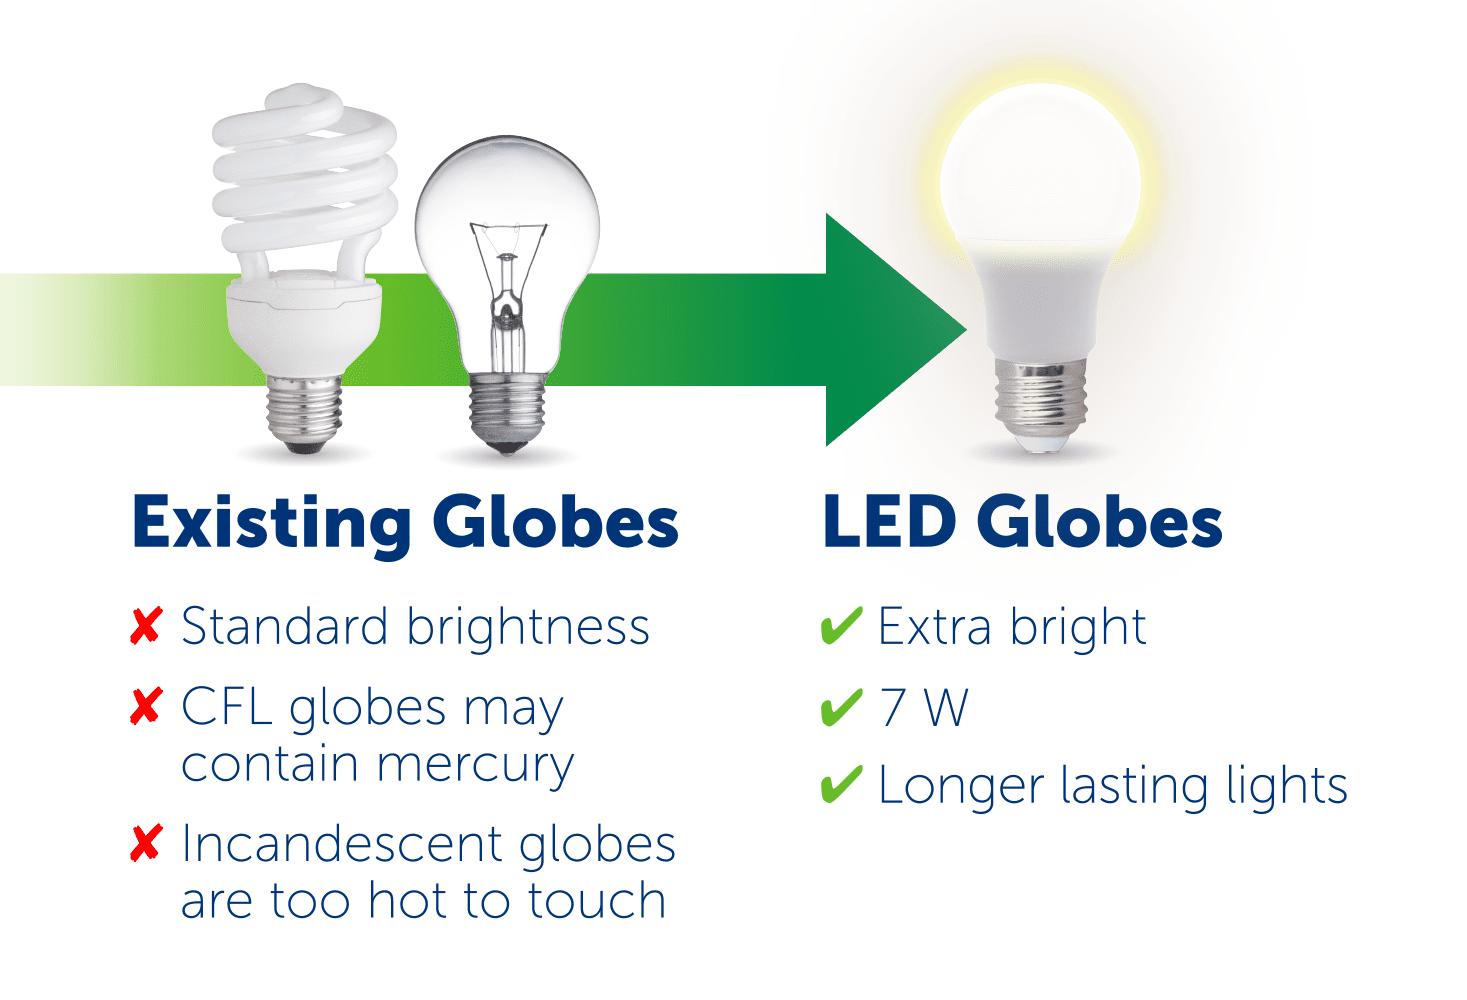 exisiting-globes-vs-led-globes